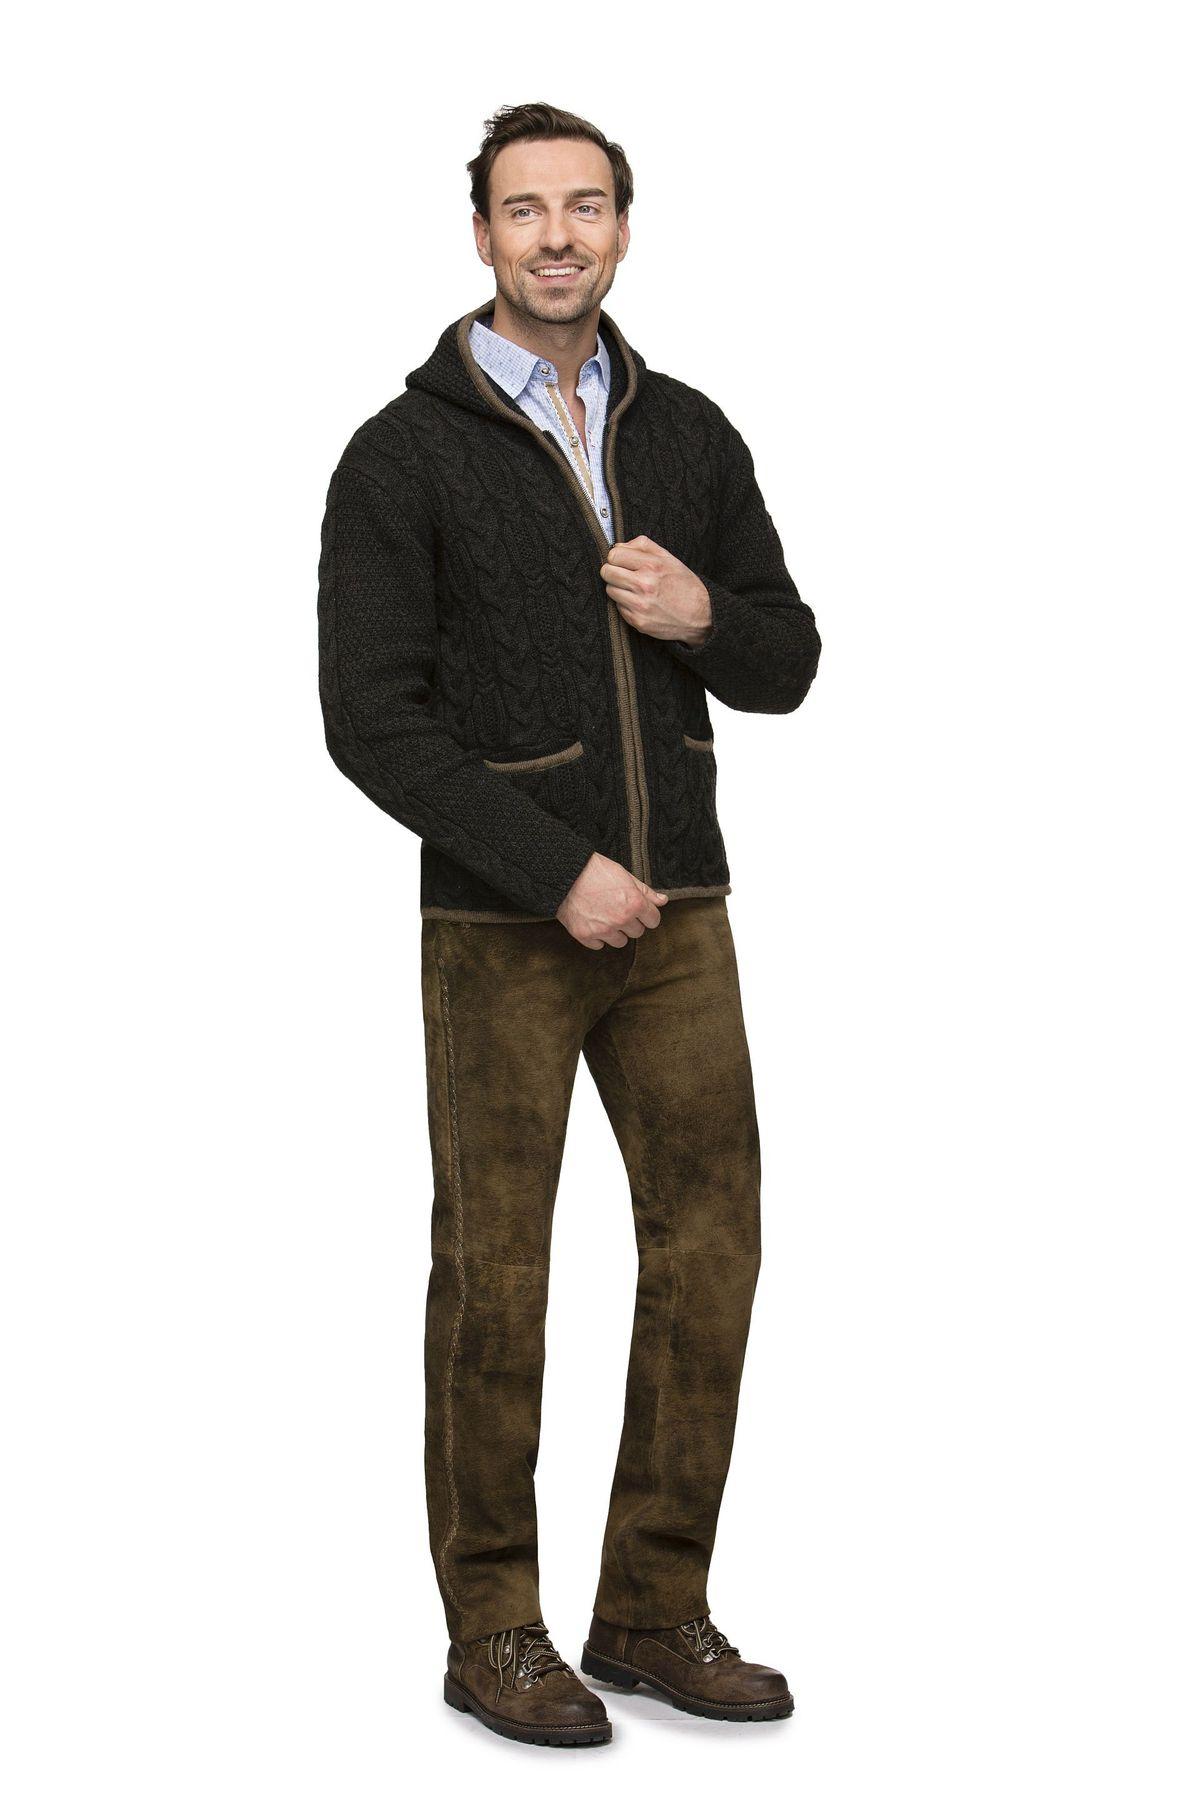 Stockerpoint - Herren Trachten Strickjacke mit Kapuze, Tilo – Bild 4